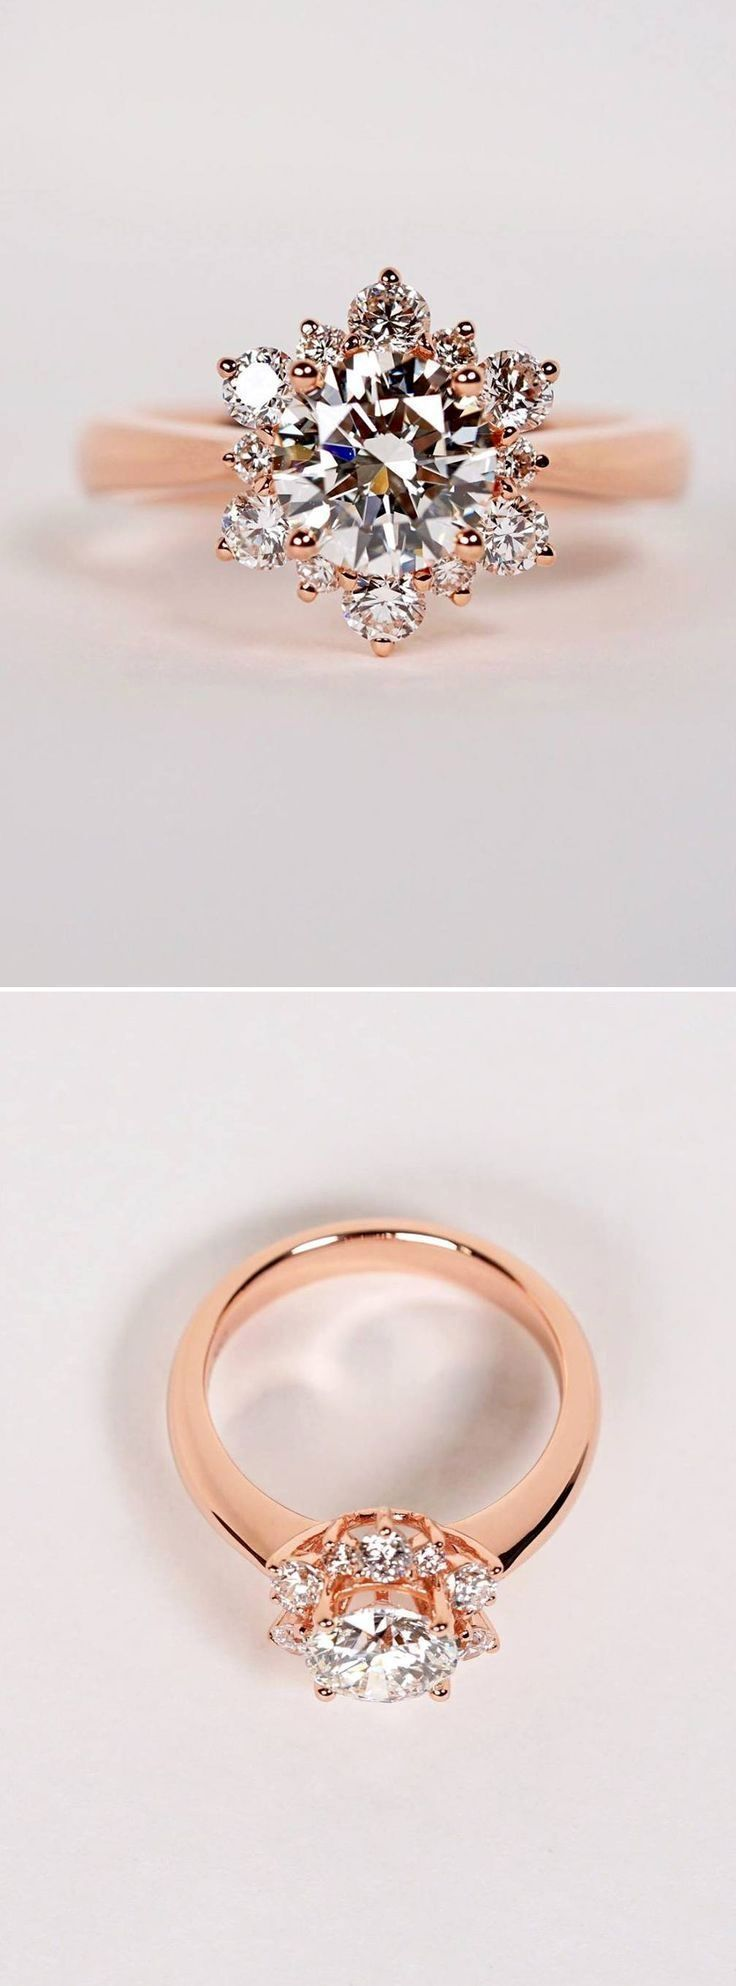 Best 25+ Beautiful engagement rings ideas on Pinterest ...